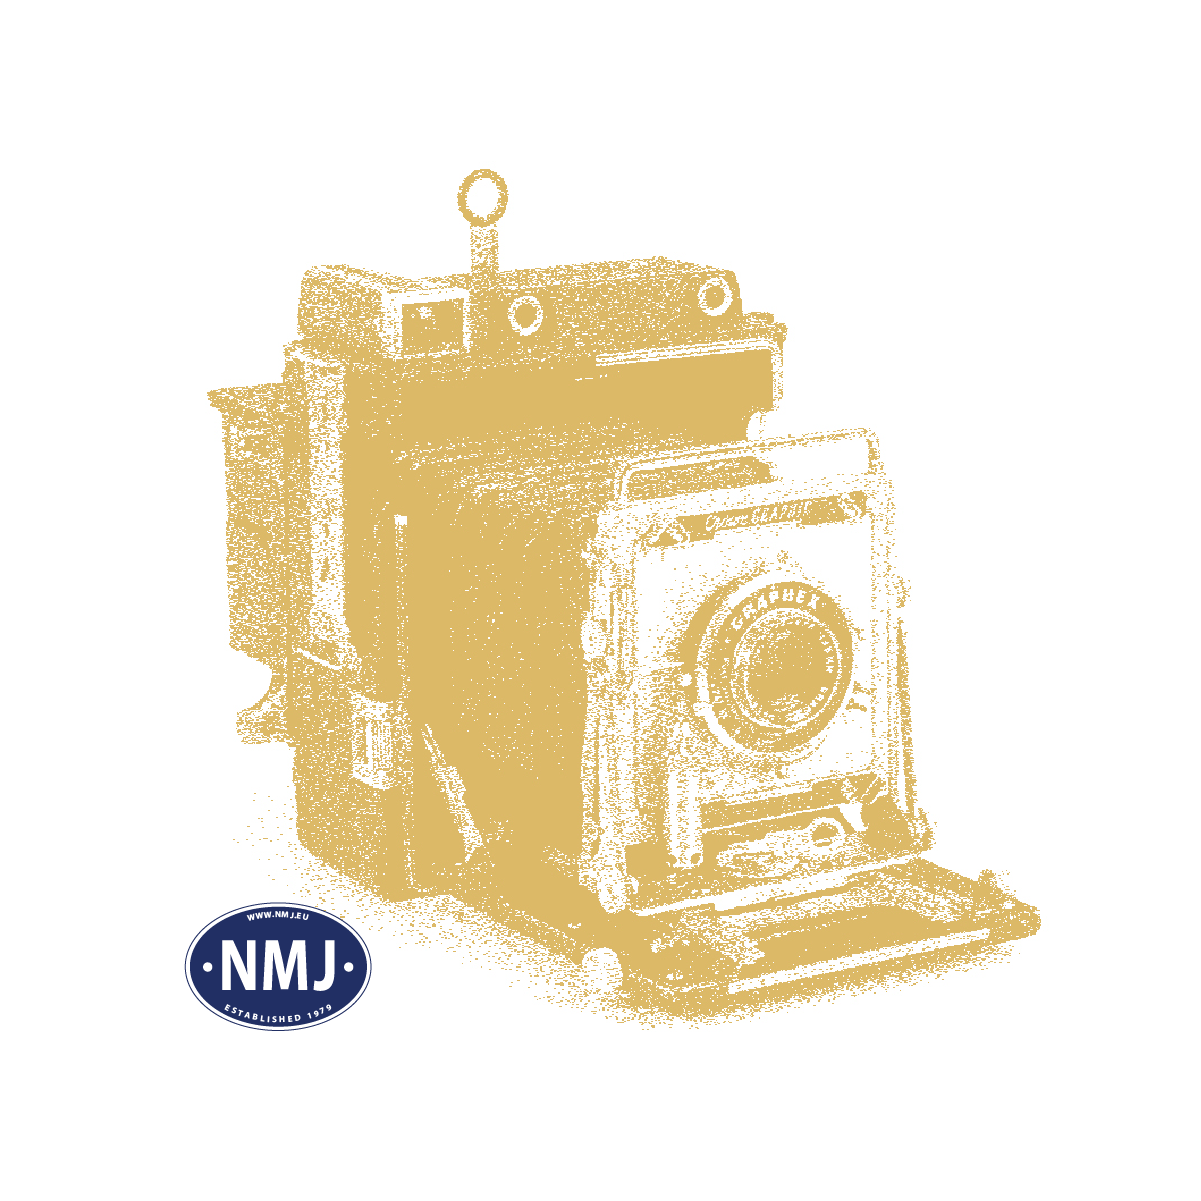 NMJT122.301 - NMJ Topline NSB A7-1 24719